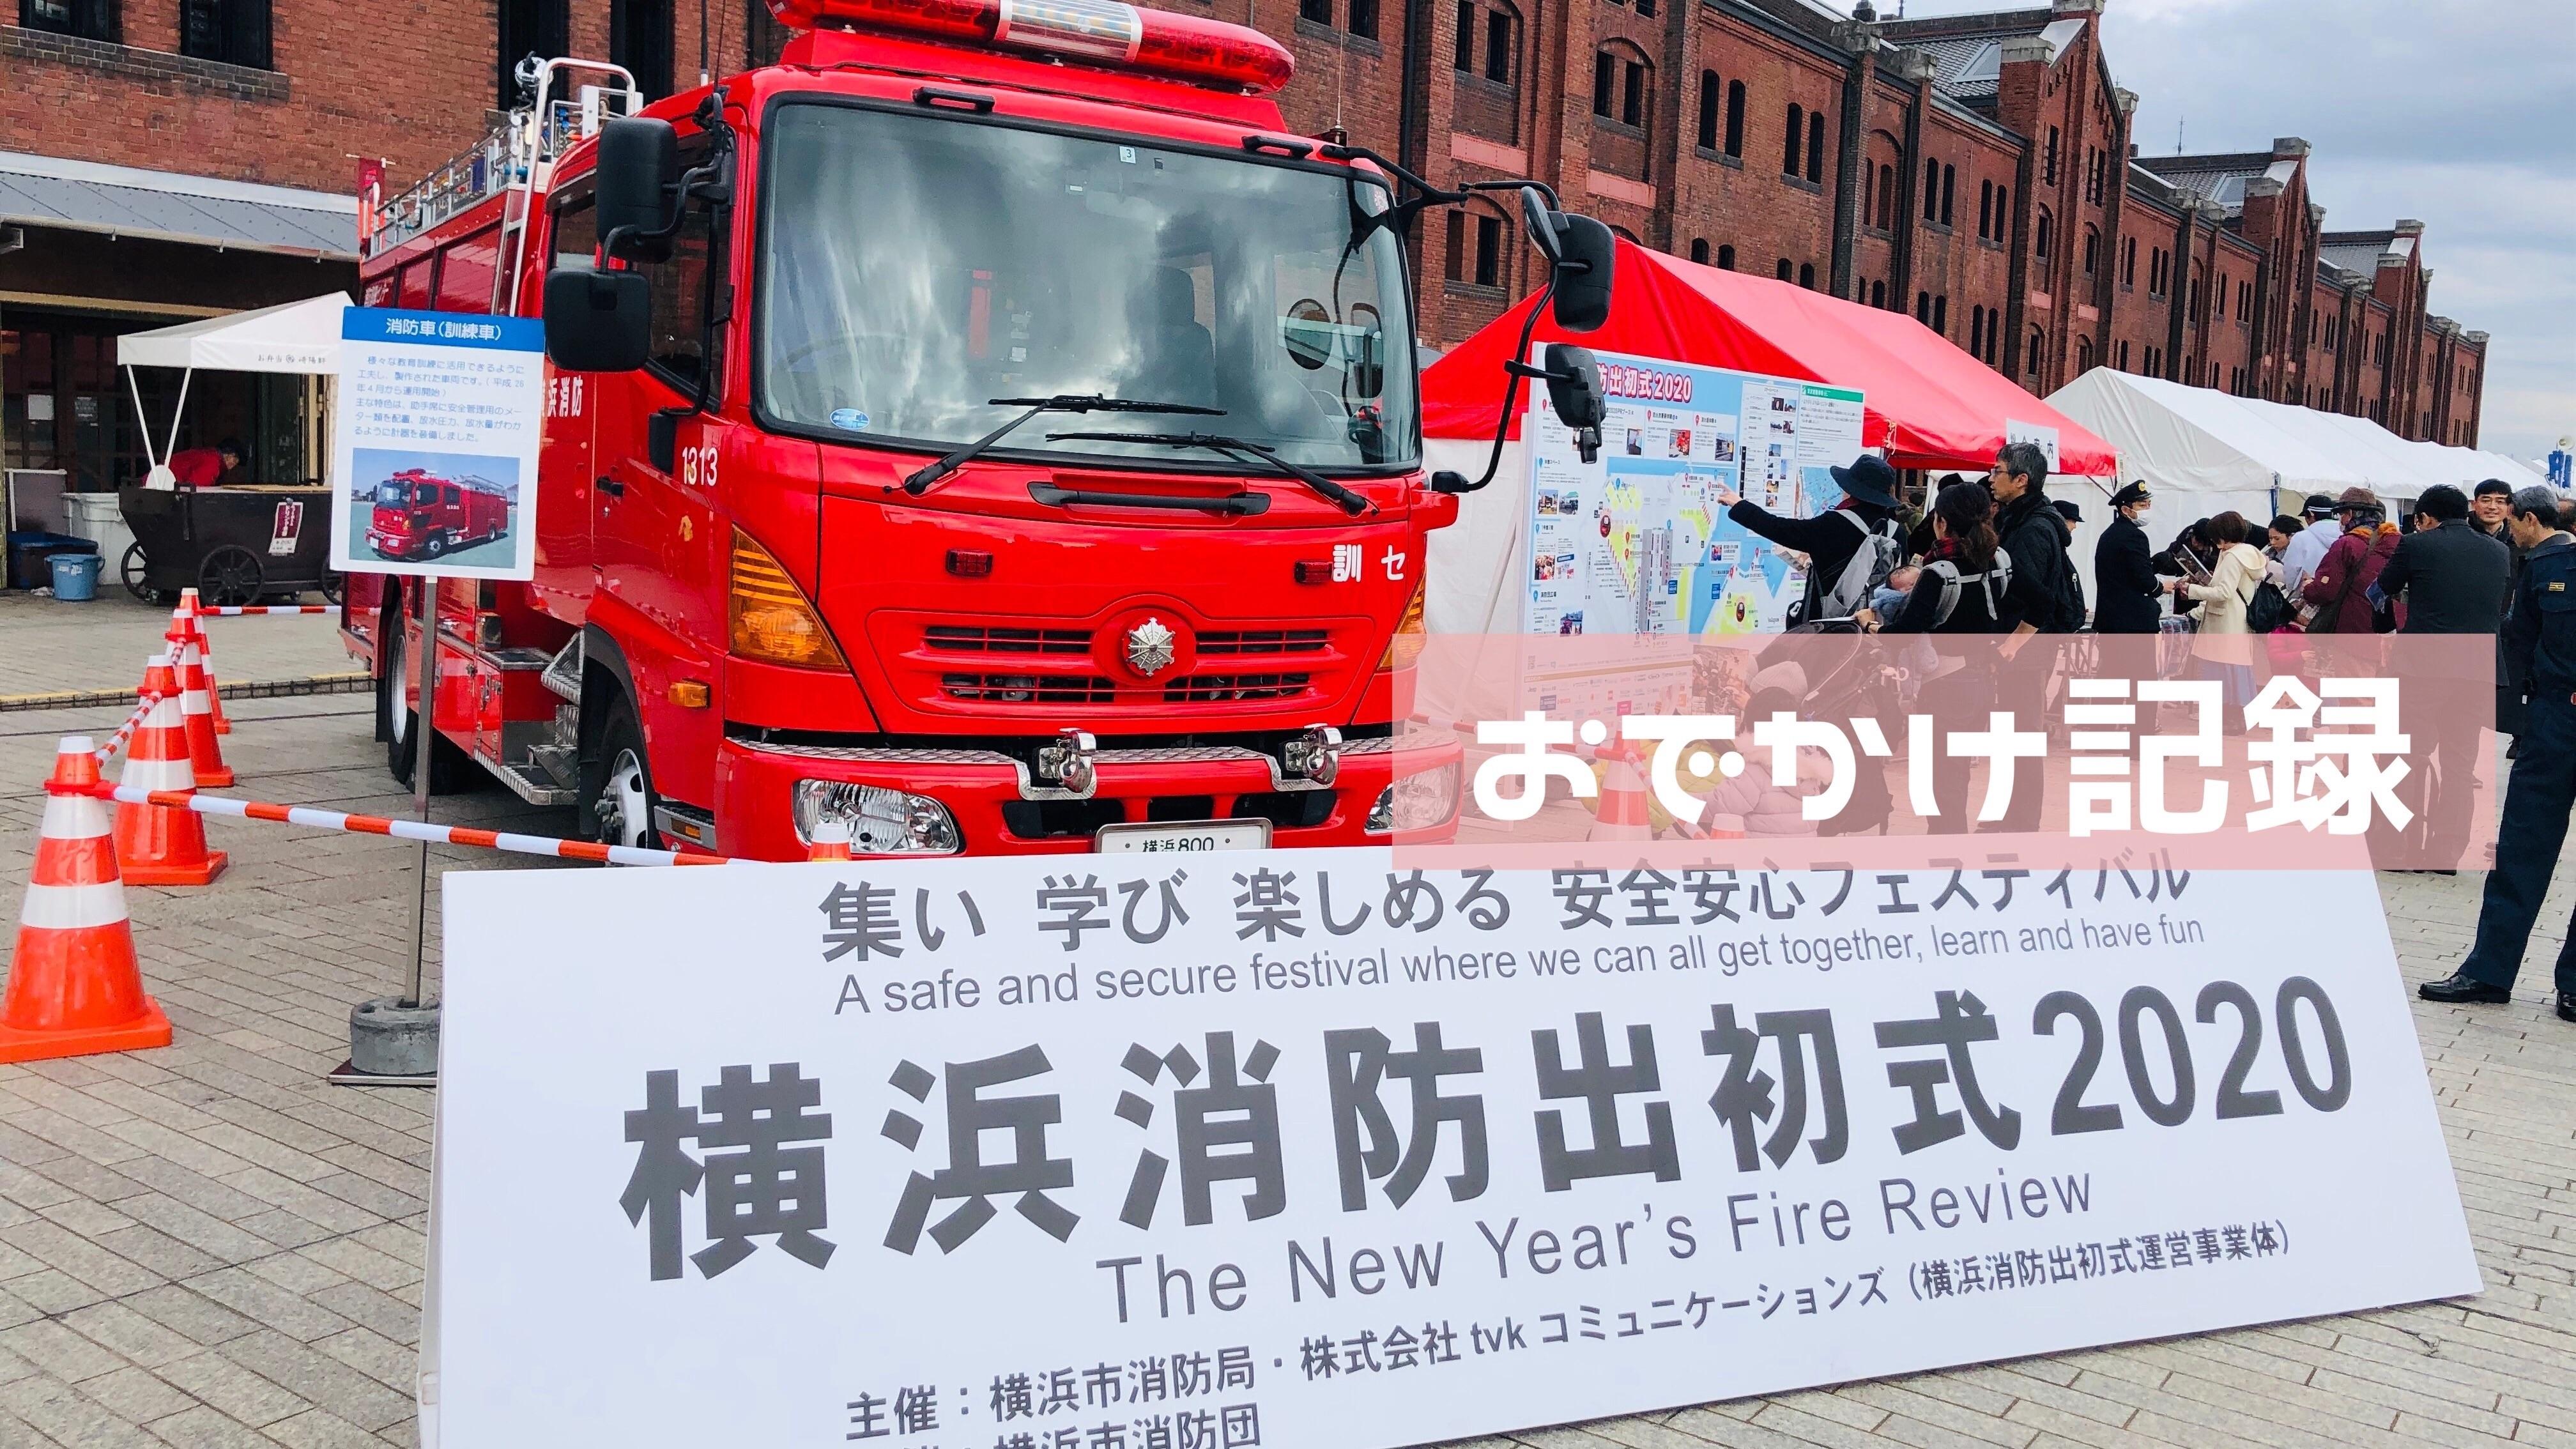 f:id:norimono-chiiku:20200115015940j:image